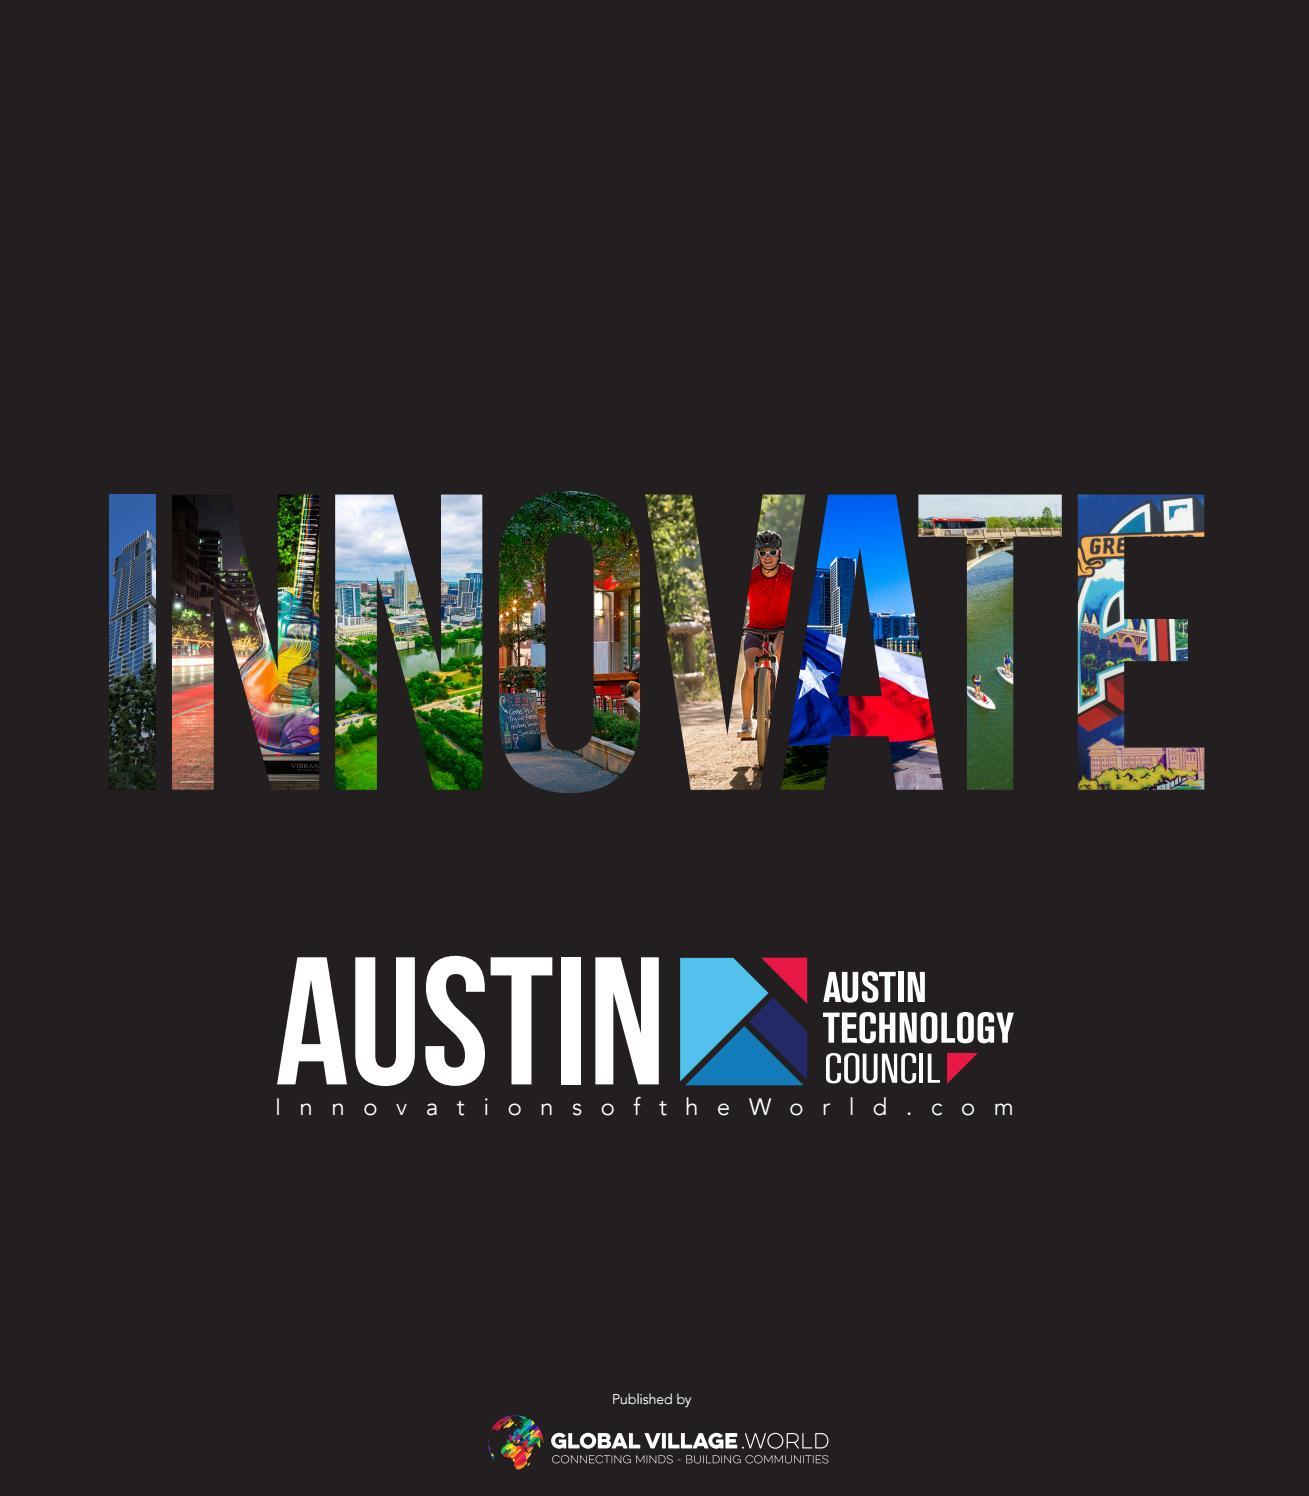 beste plaatsen om hook up in Austin